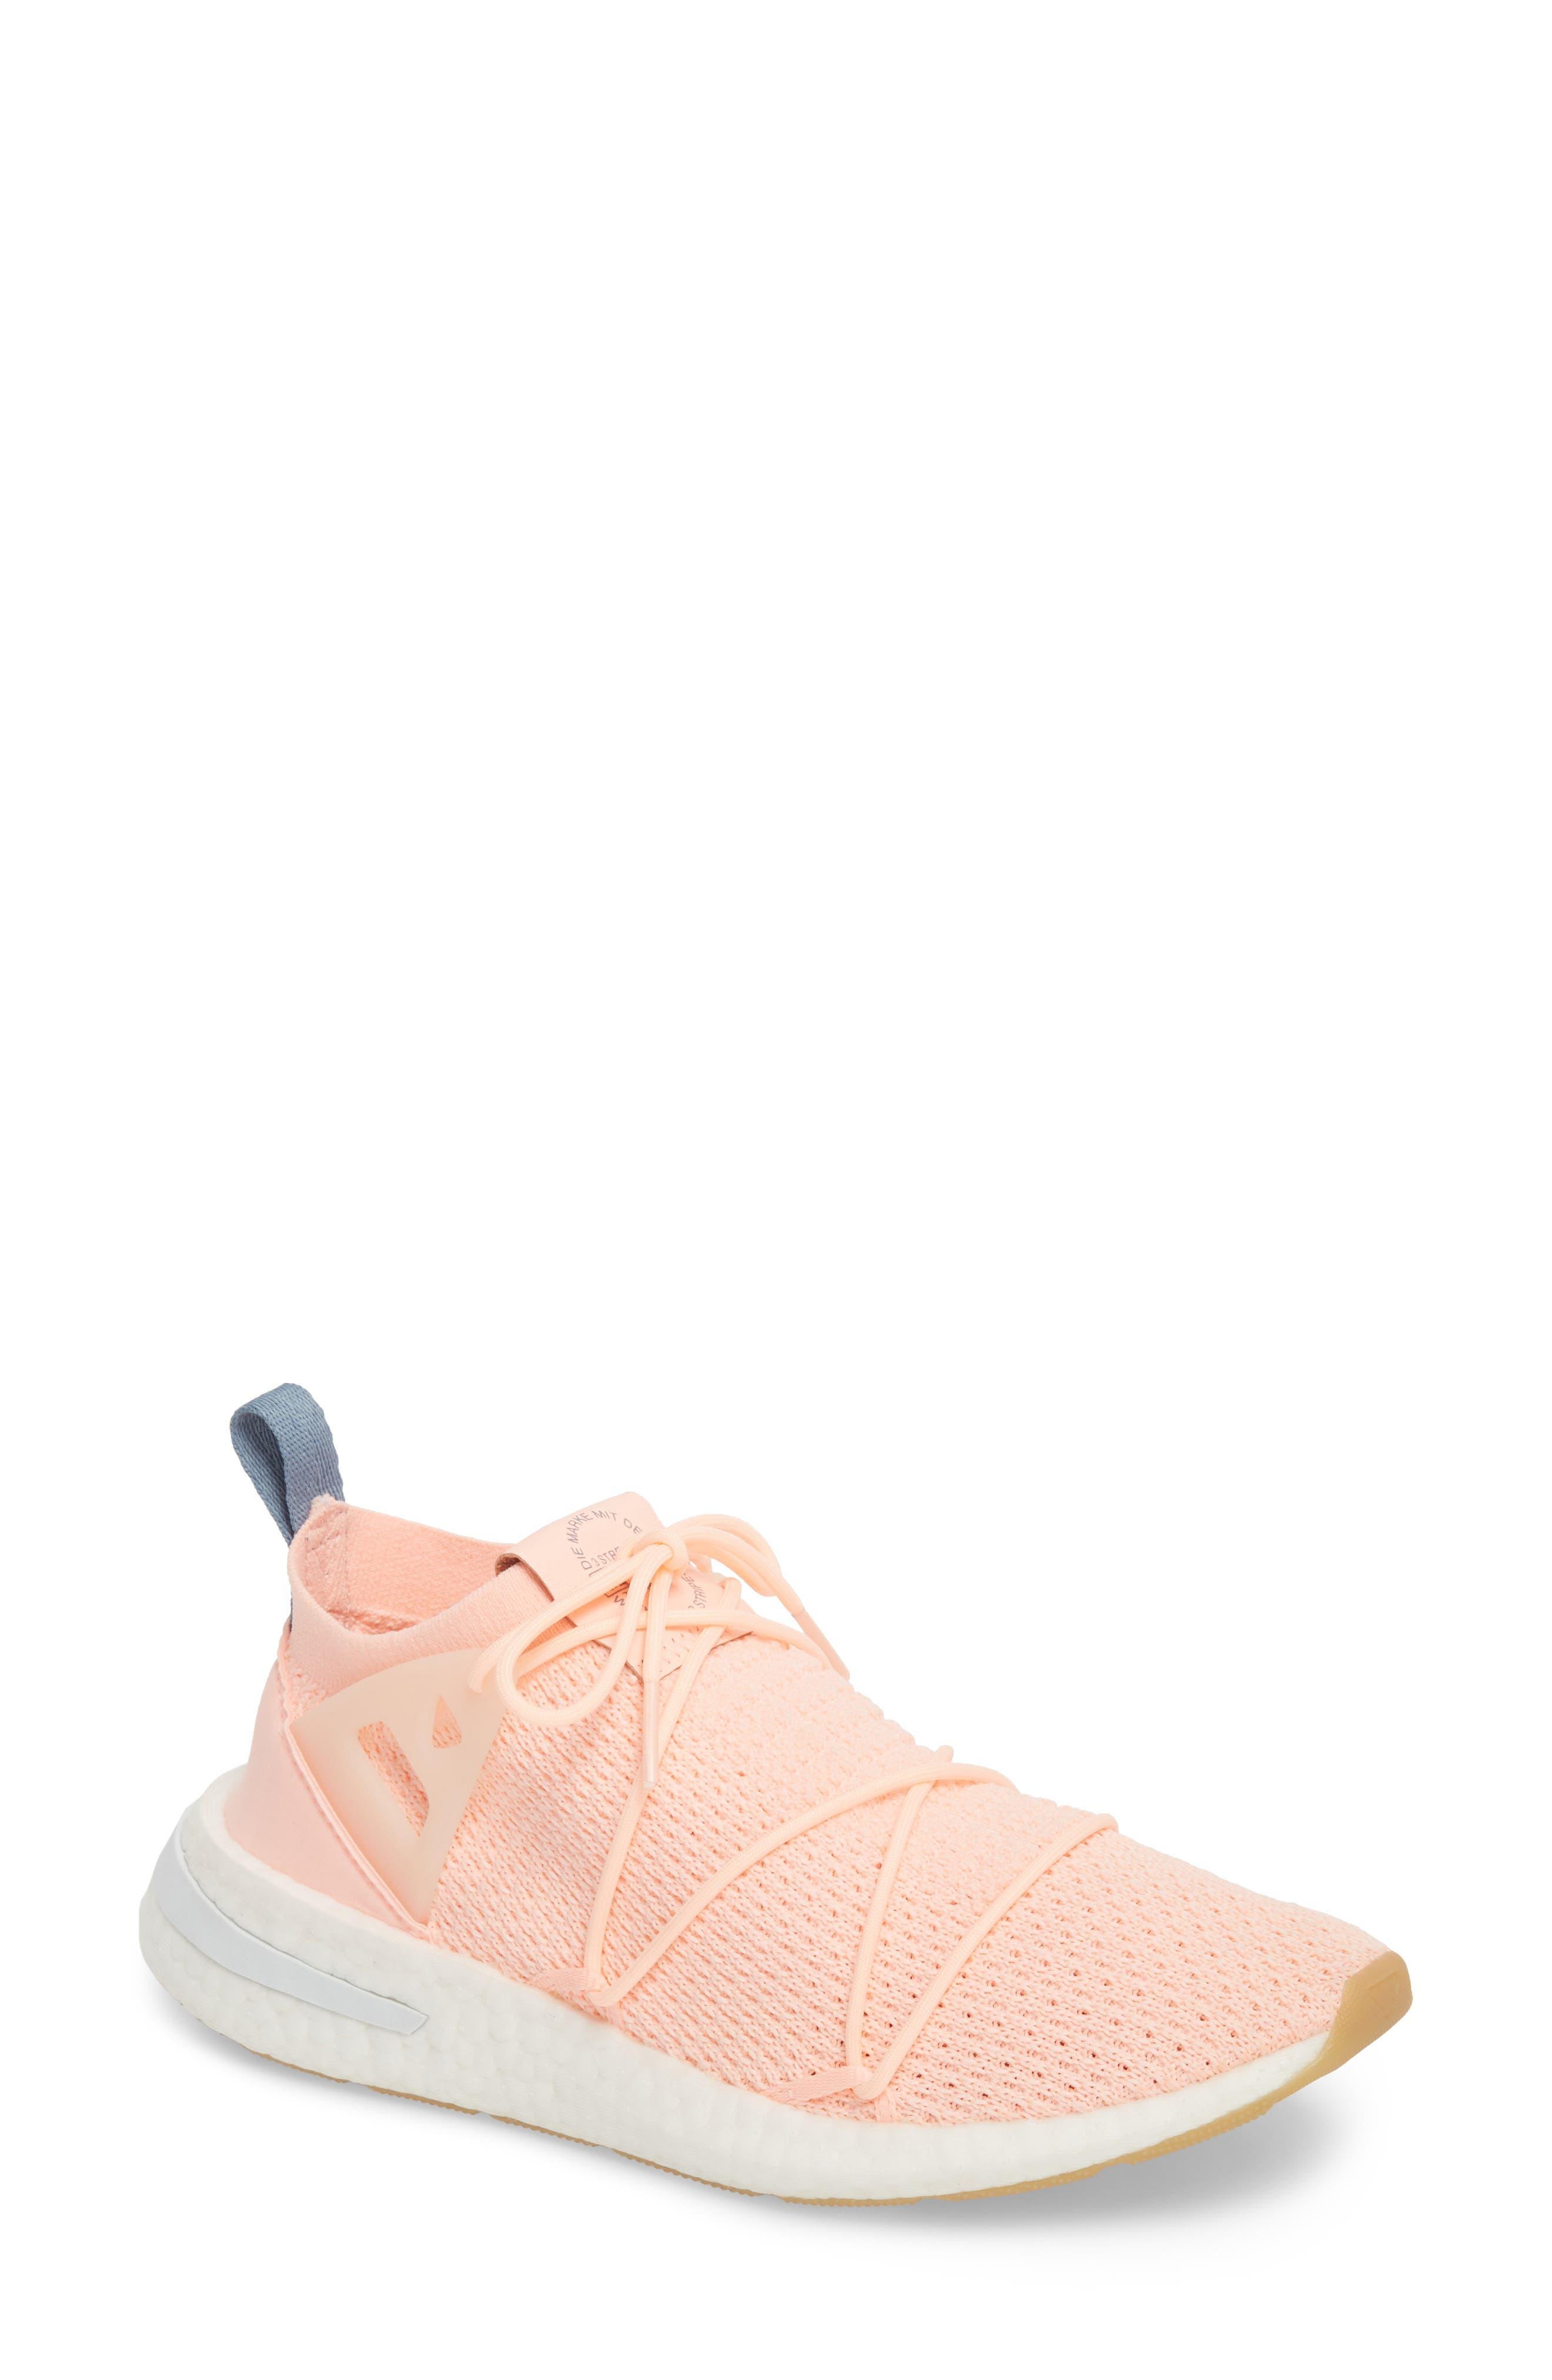 4ecdd23a5 cross training shoes